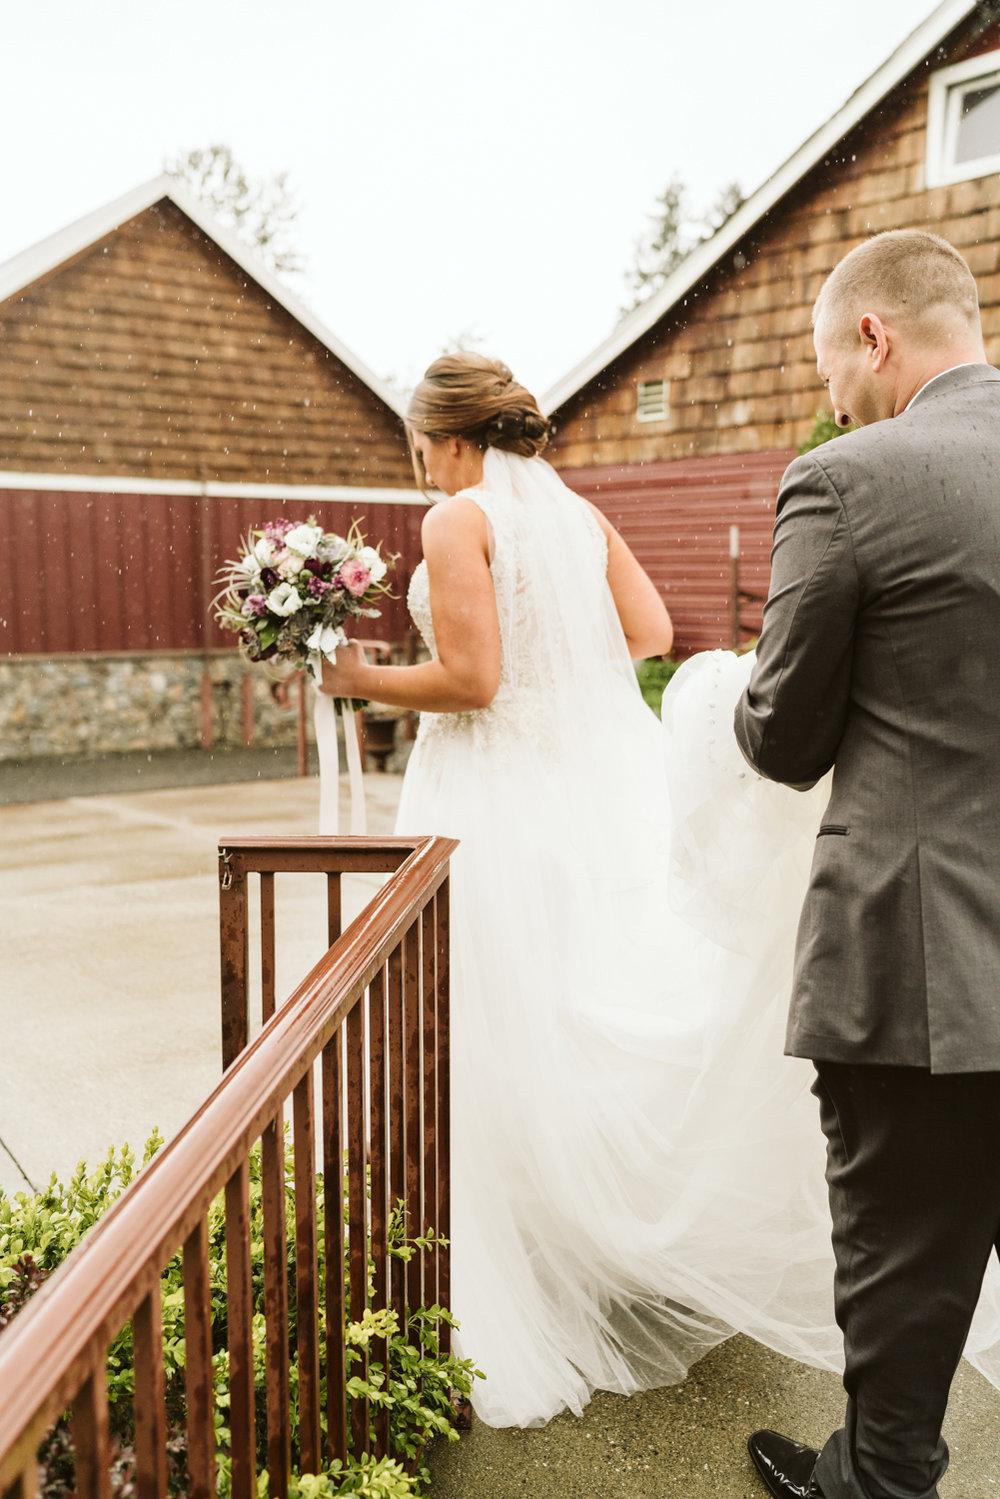 April Yentas Photography - jen and anthony wedding-53.jpg